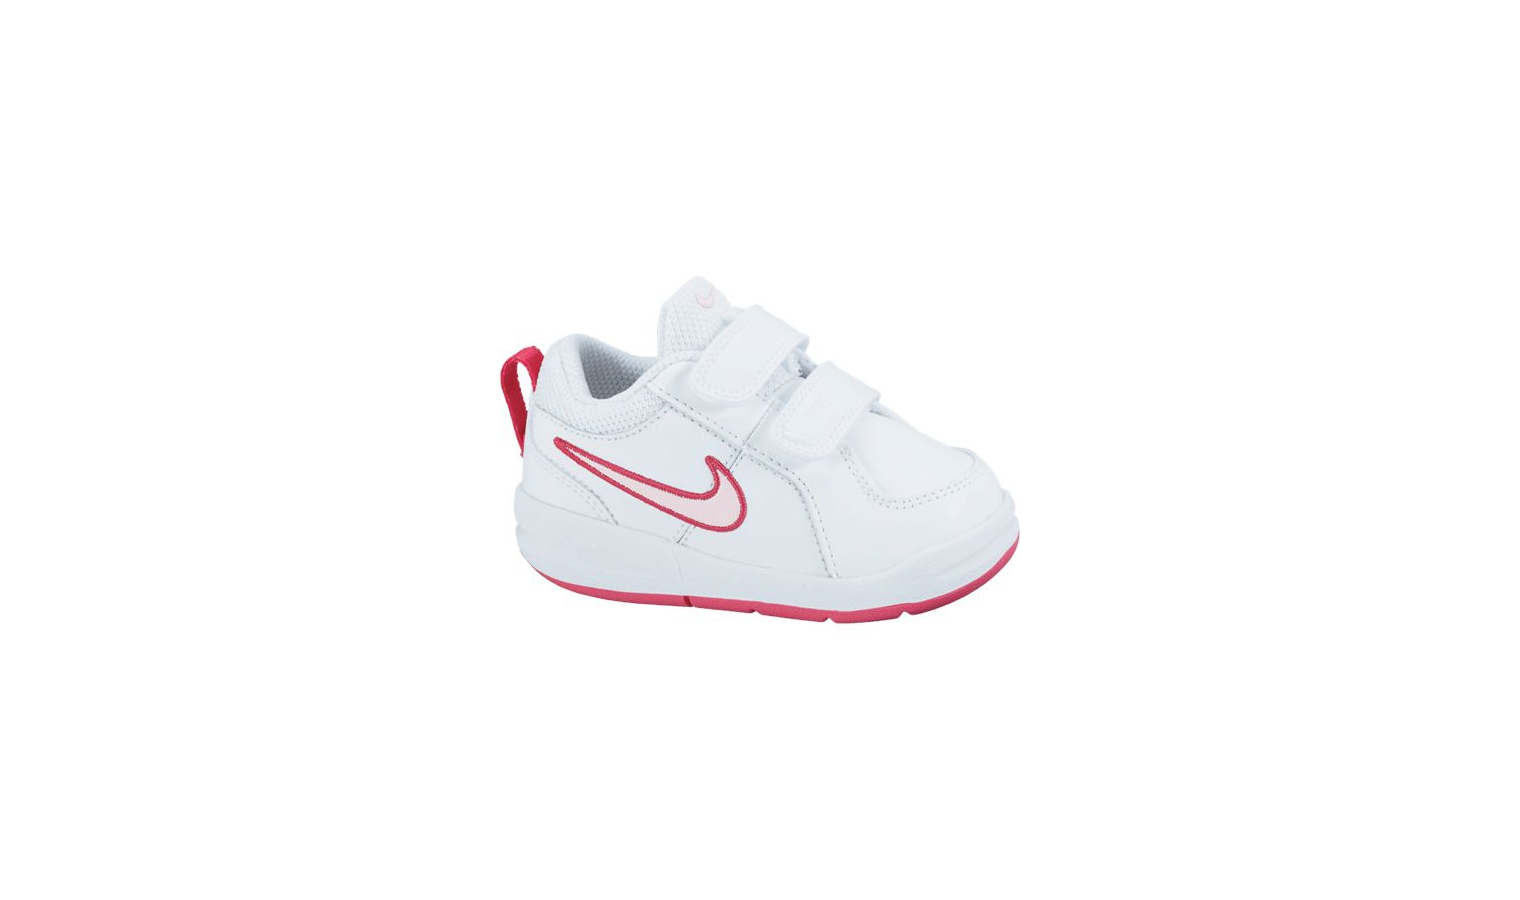 dc9093356836 Detské topánky Nike PICO 4 biele